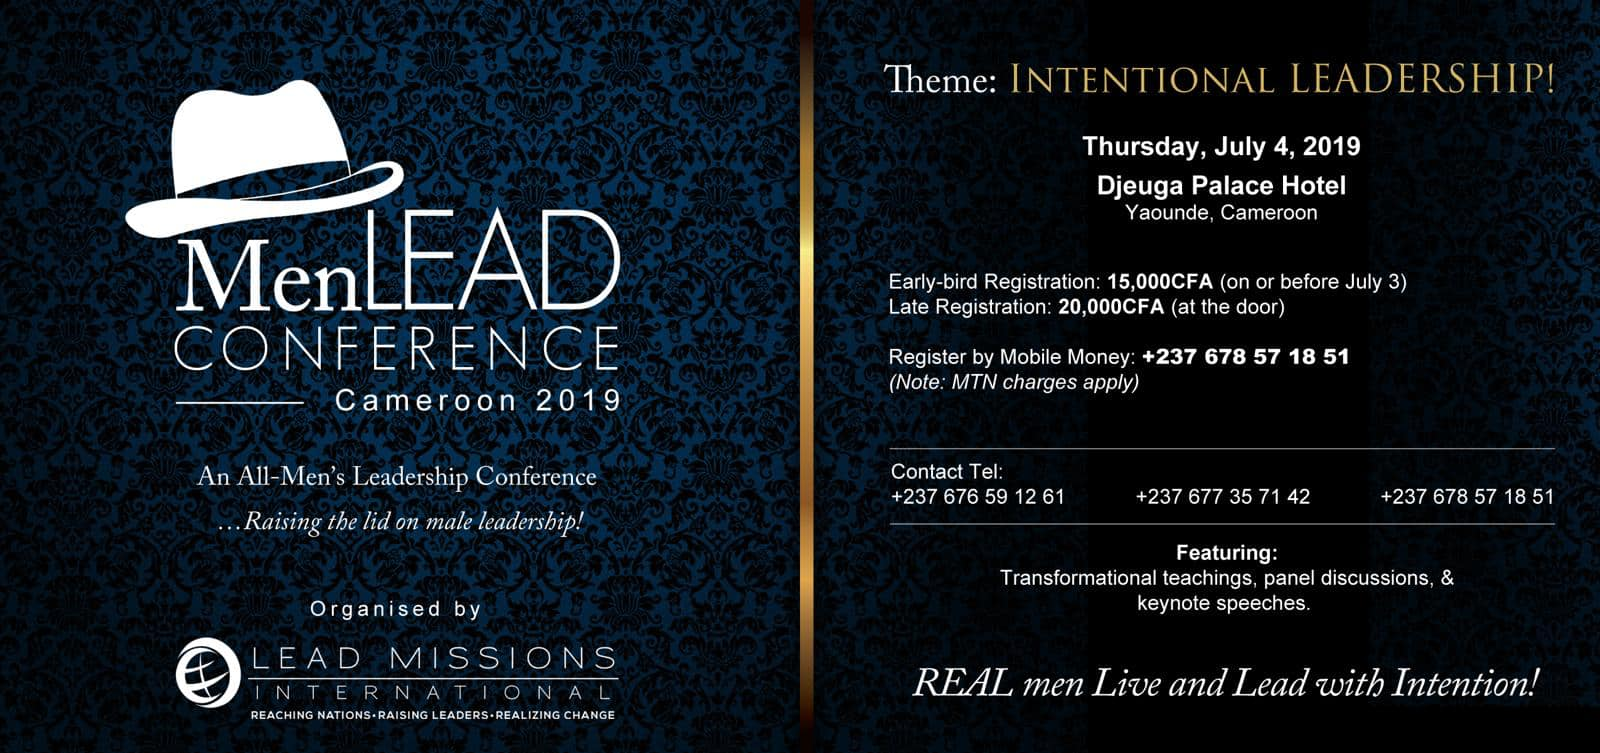 MenLEAD Conference 2019